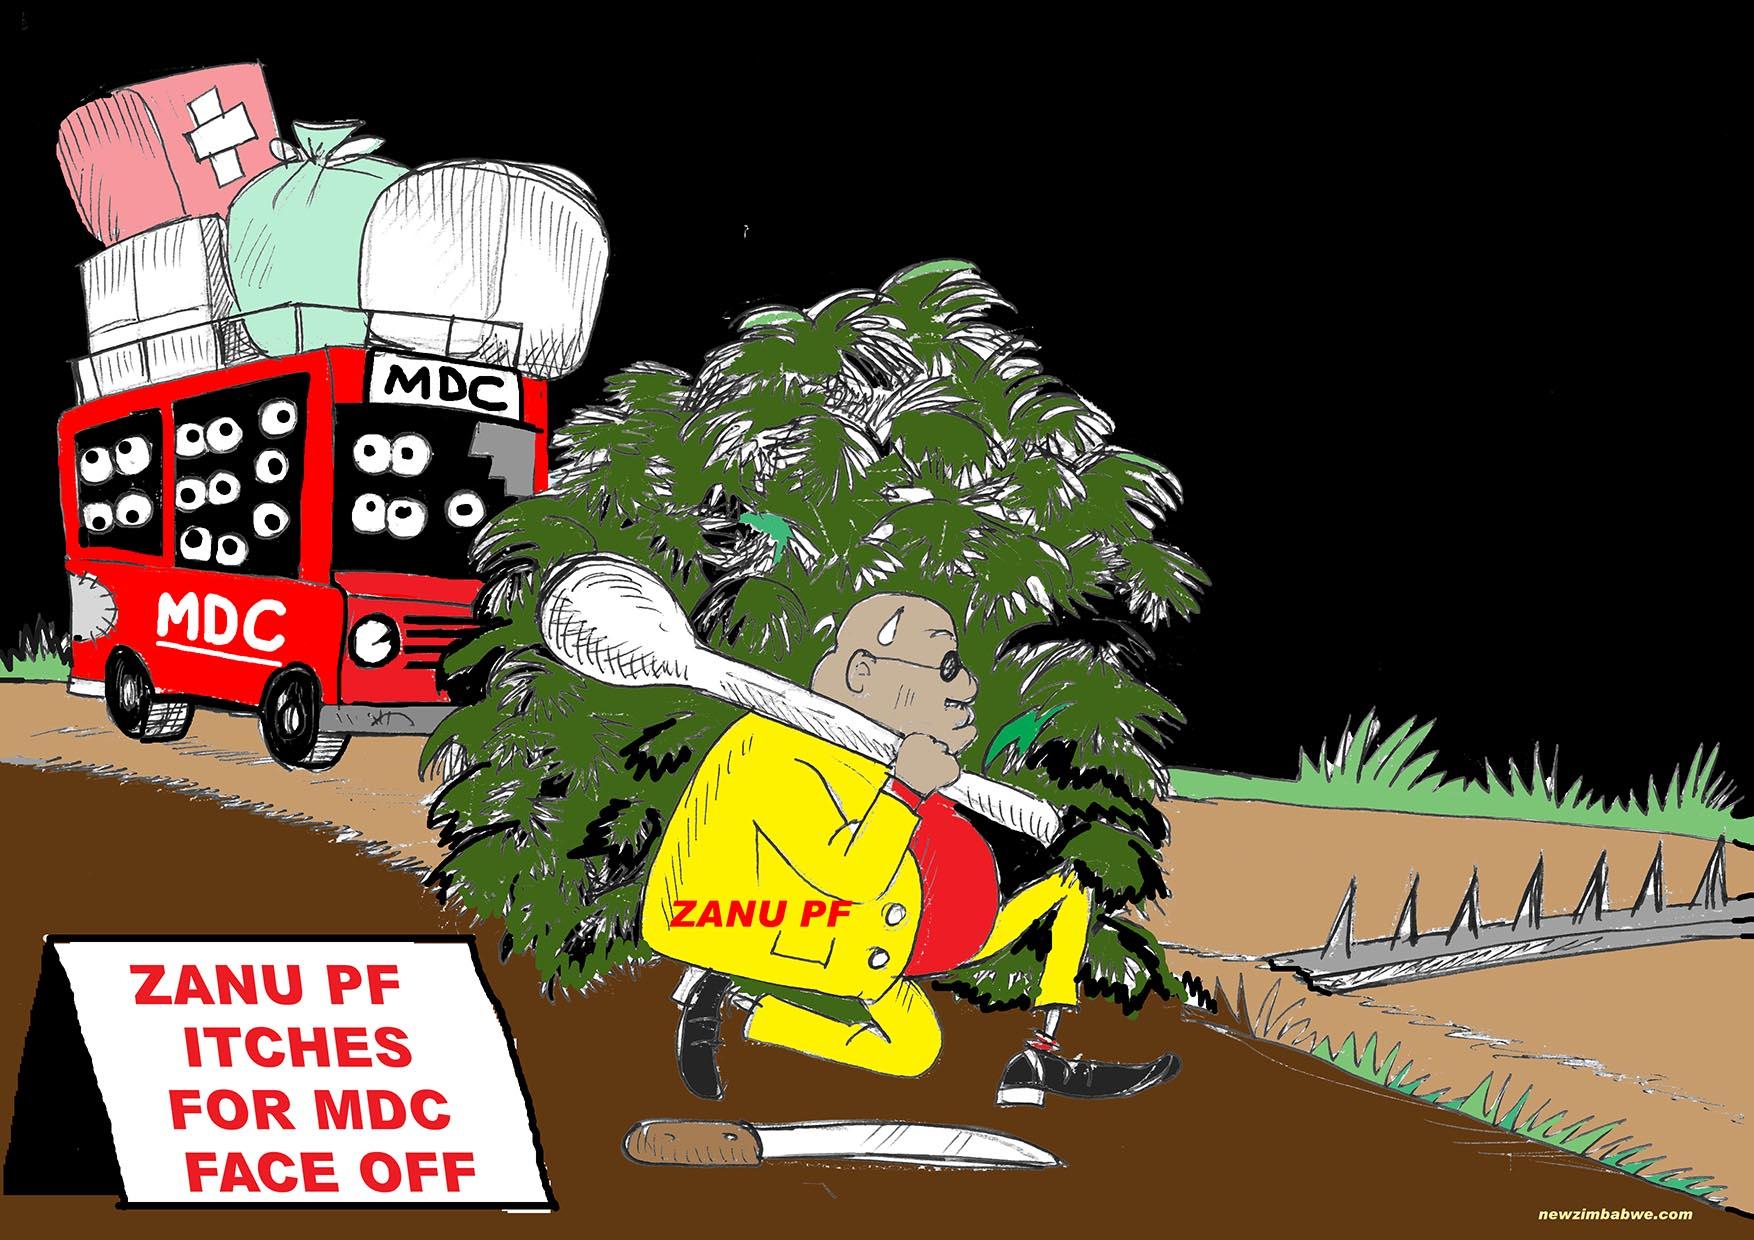 ZANU PF and MDC face-off